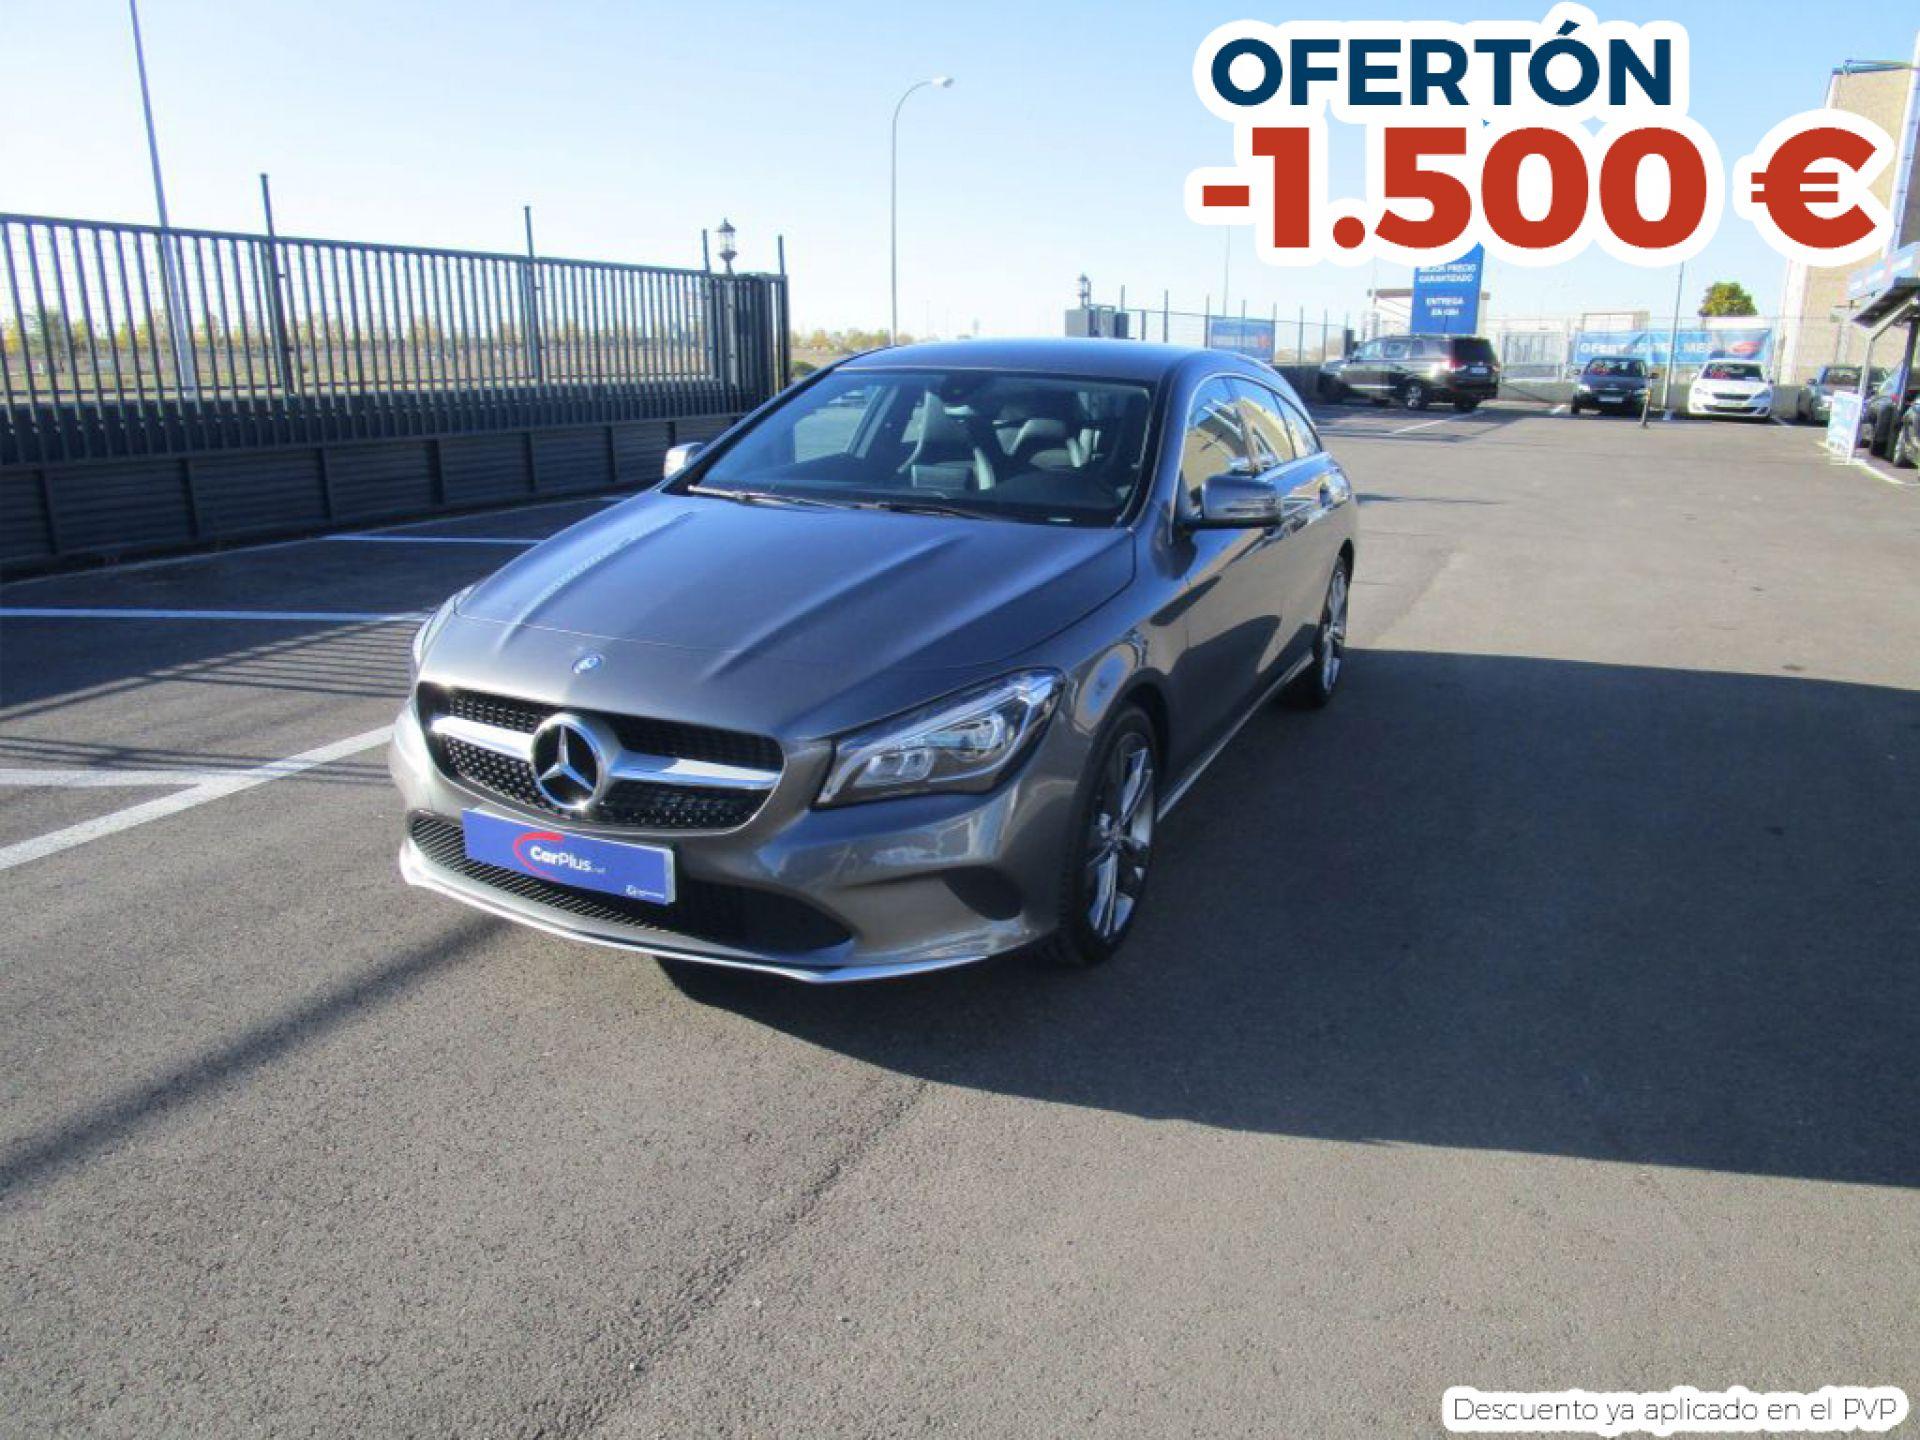 Mercedes Benz Clase CLA 200 d Shooting Brake segunda mano Madrid